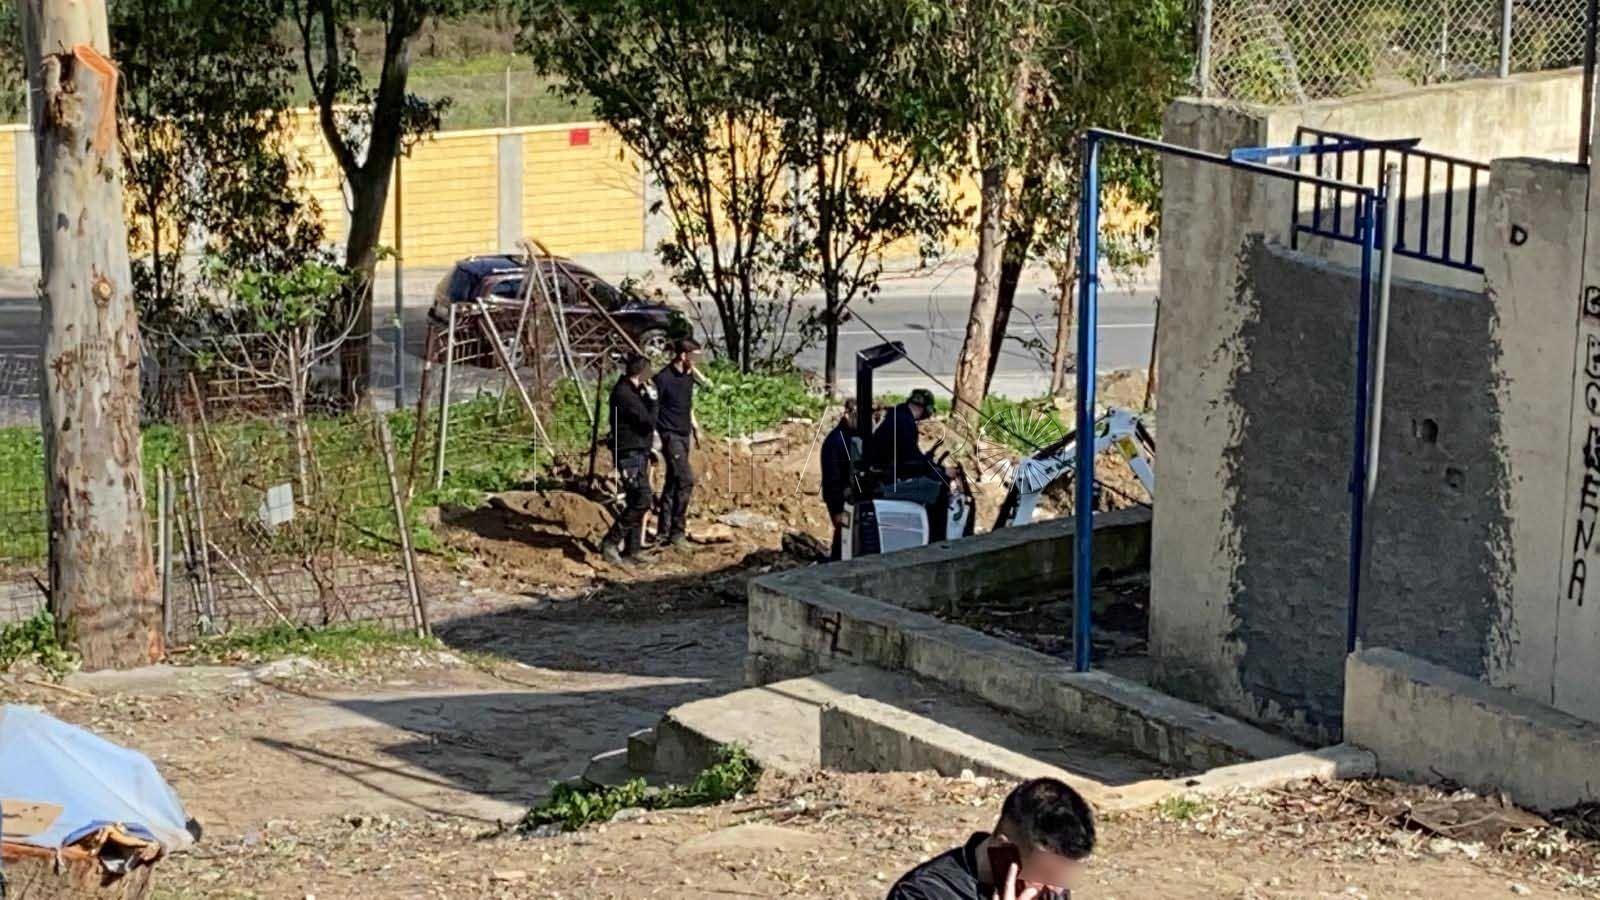 policia-operacion-busqueda-armas-2